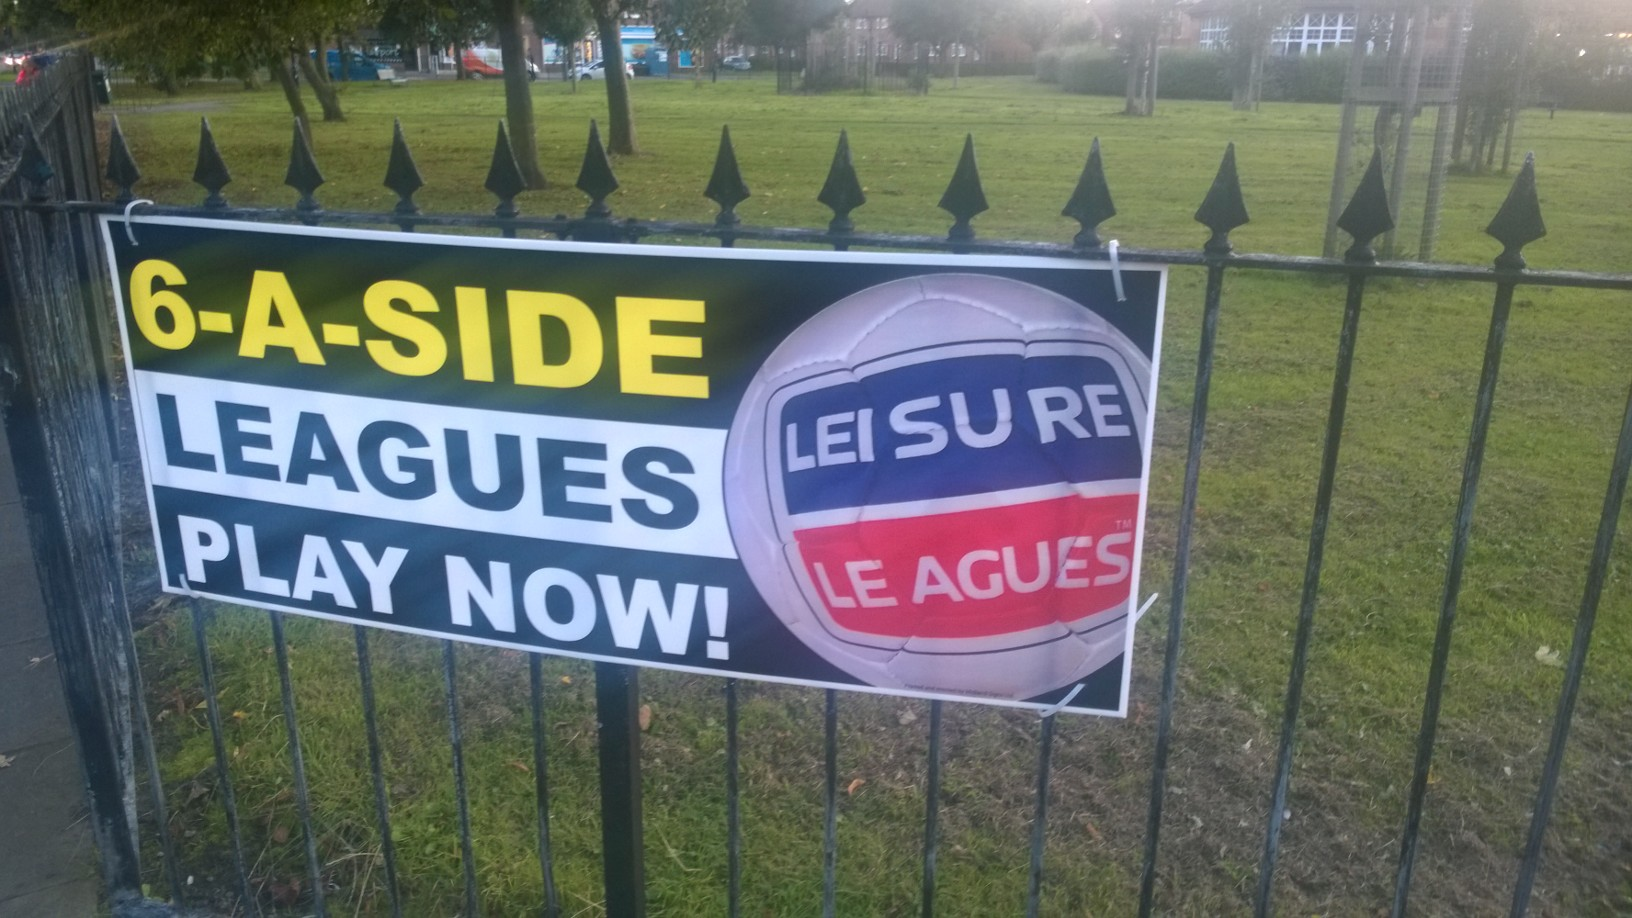 Leisure League